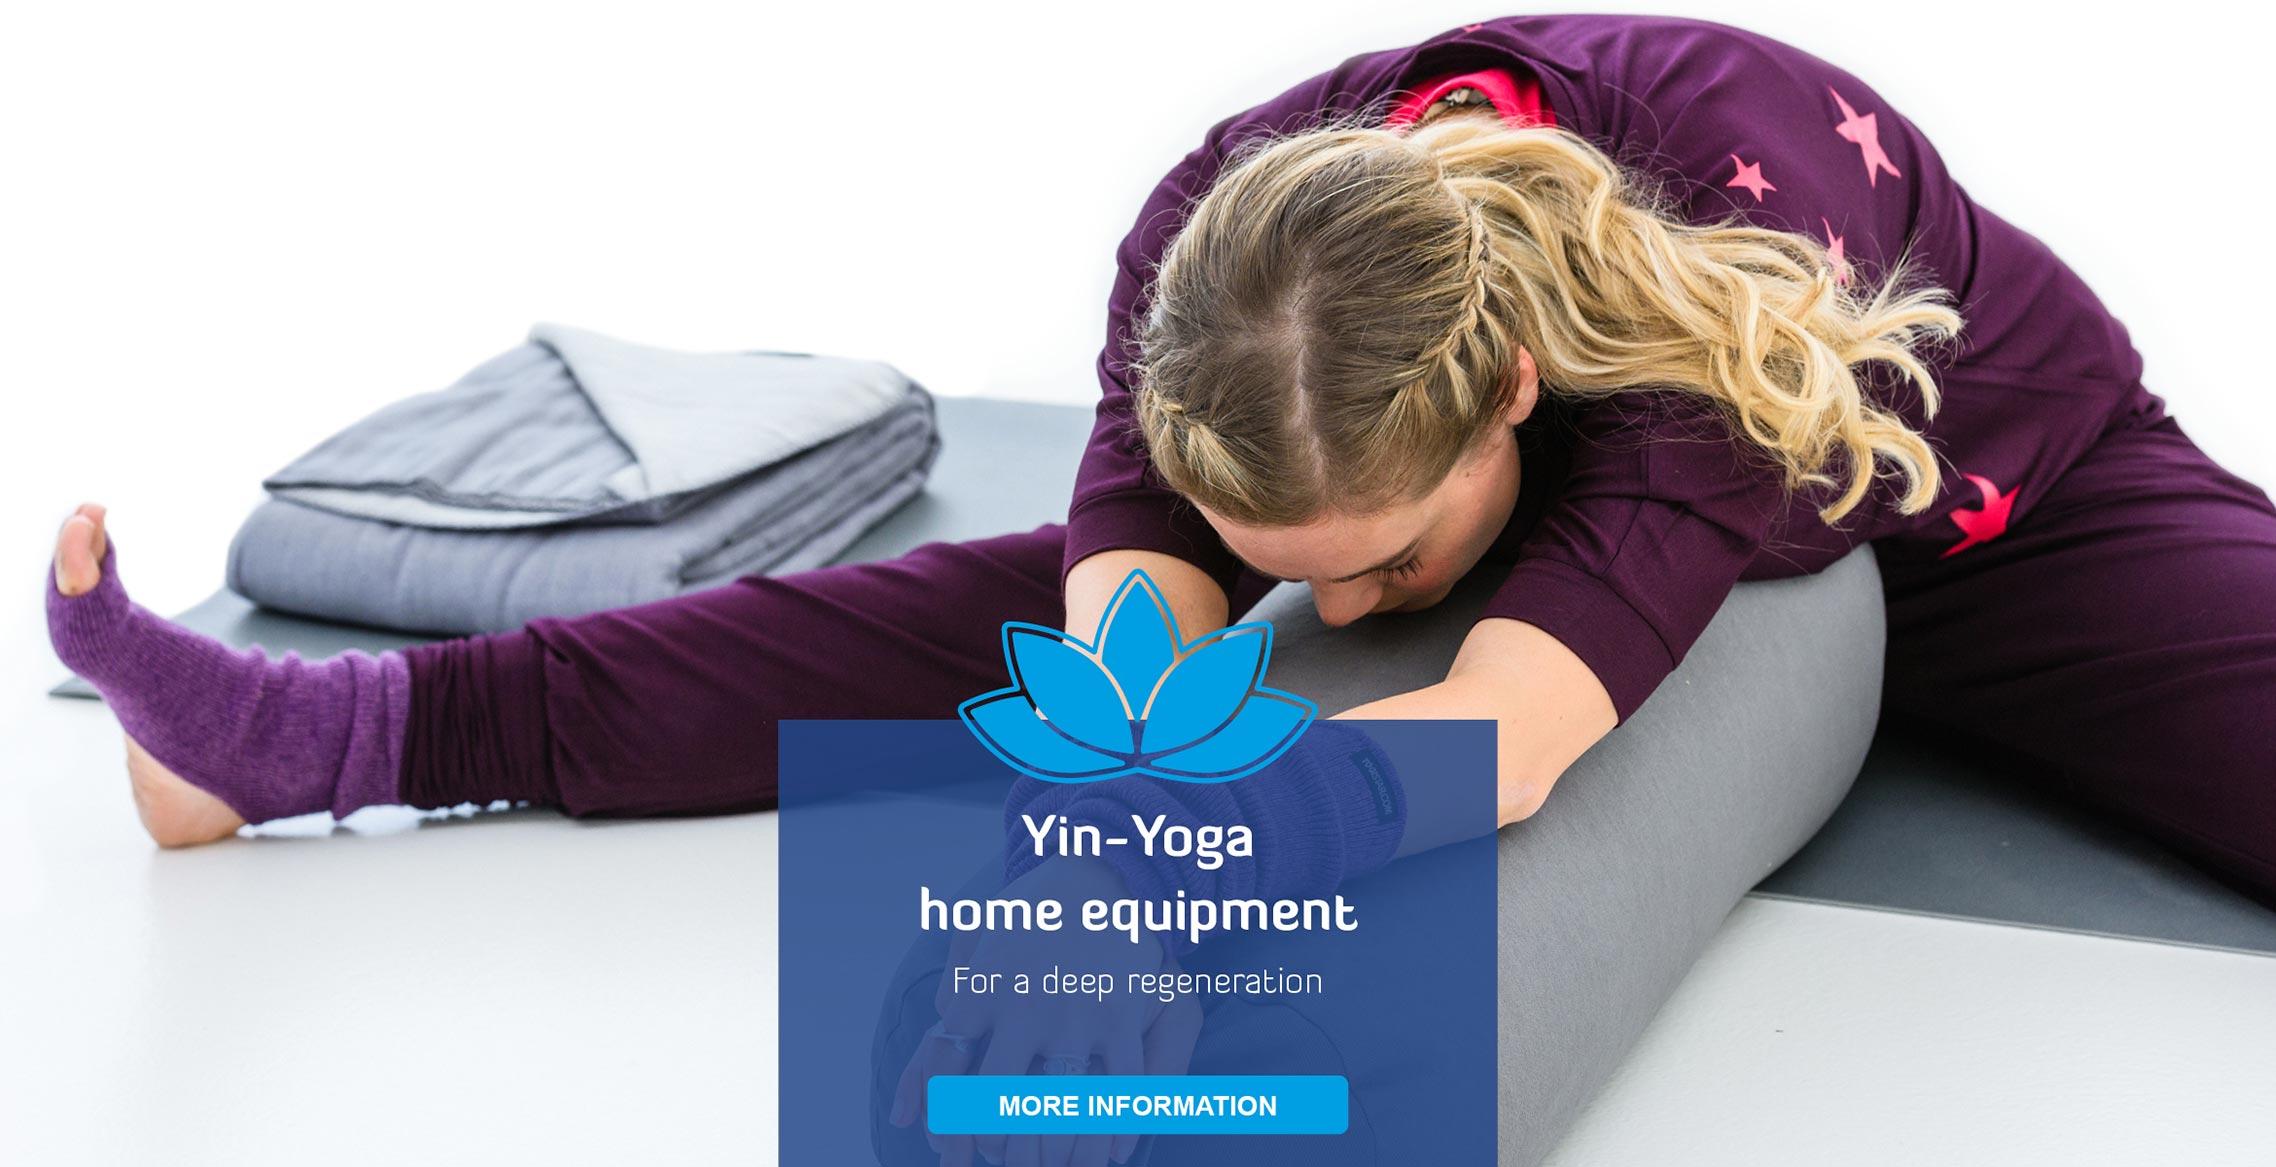 Startseite Teaser Yin-Yoga